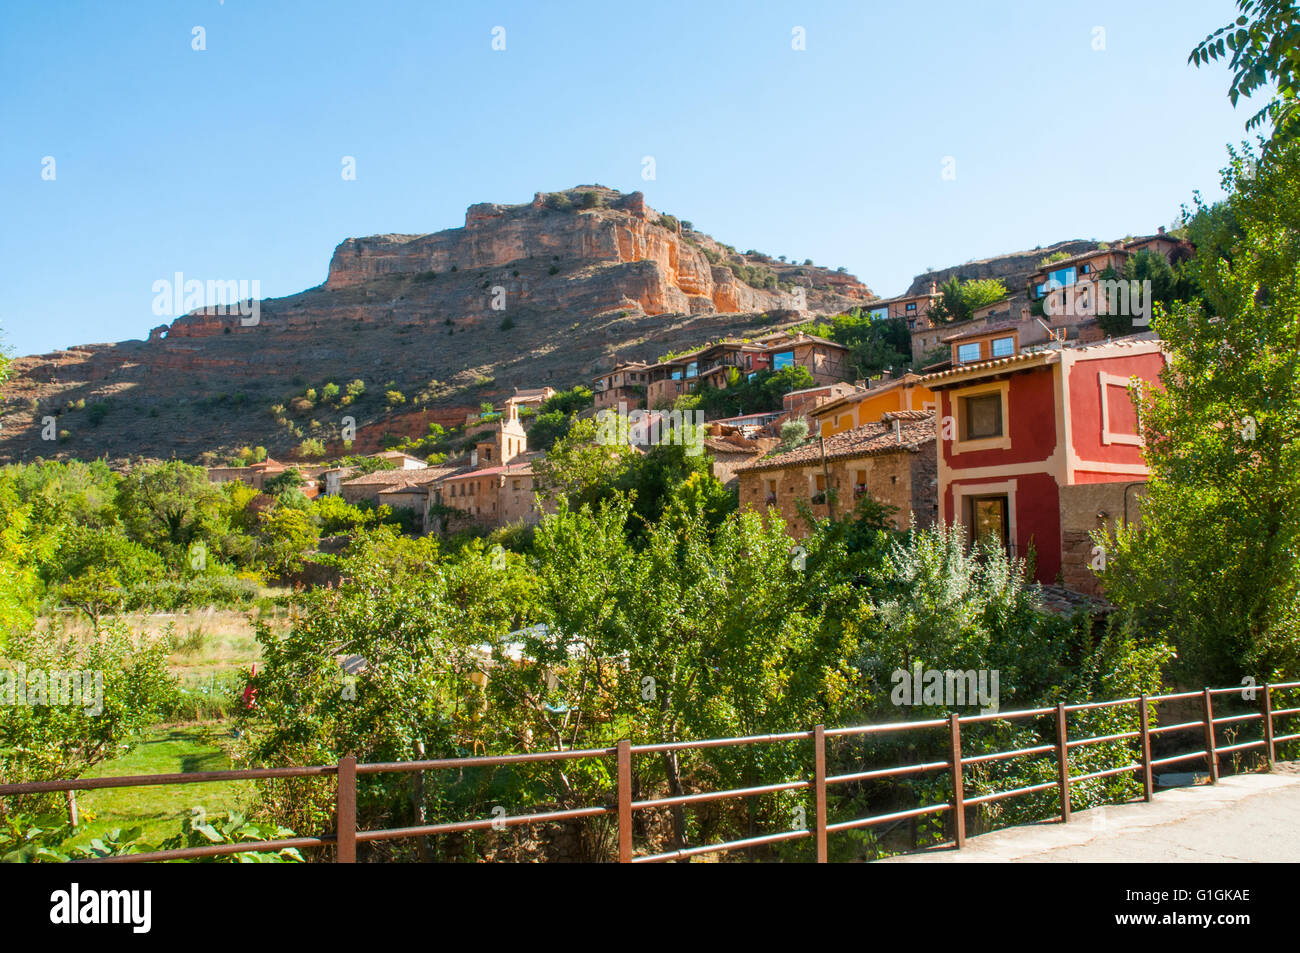 Overview. Somaen, Soria province, Castilla Leon, Spain. - Stock Image